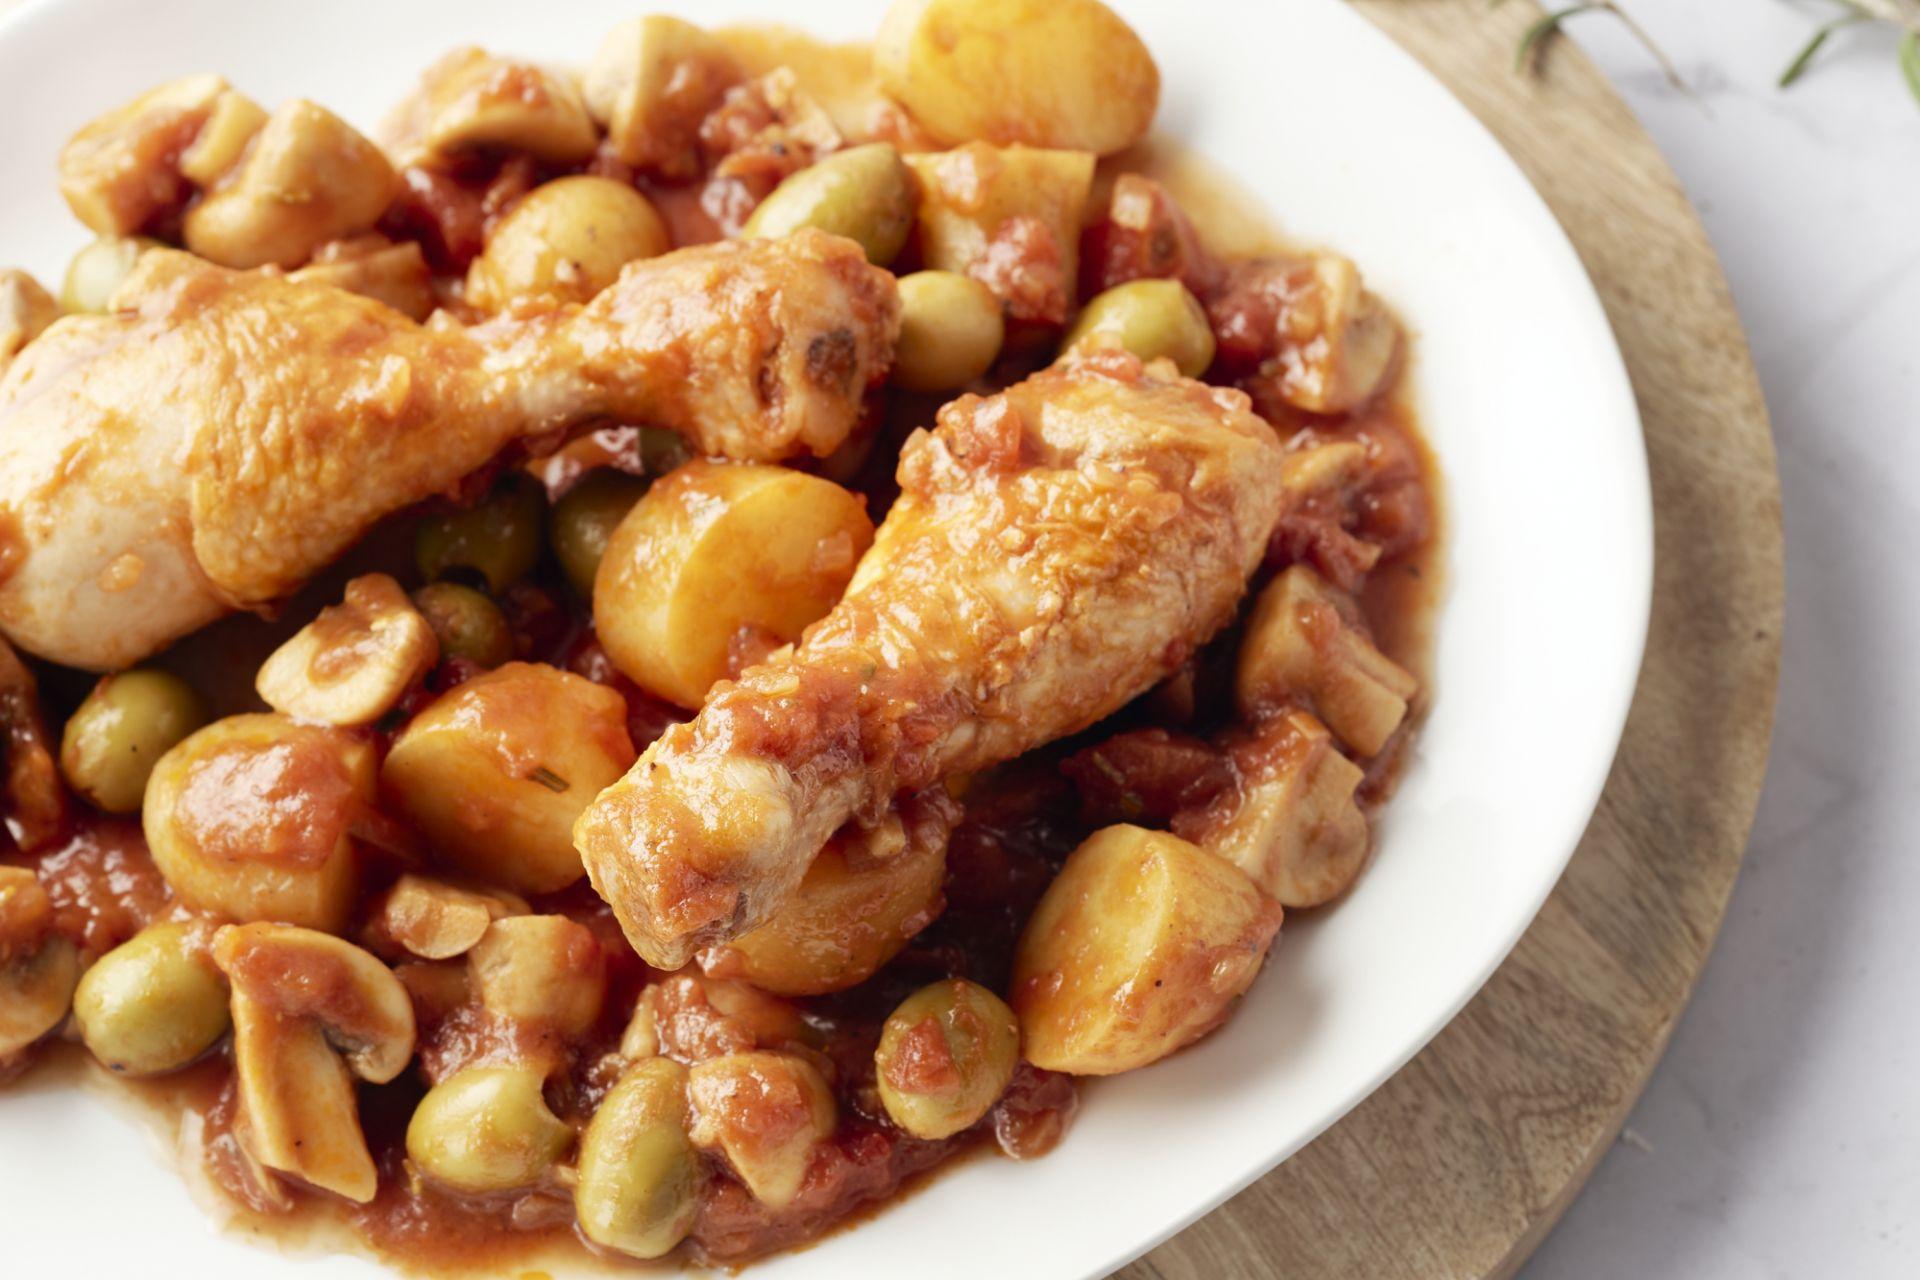 Jagersstoofpotje met kip (pollo alla cacciatora)